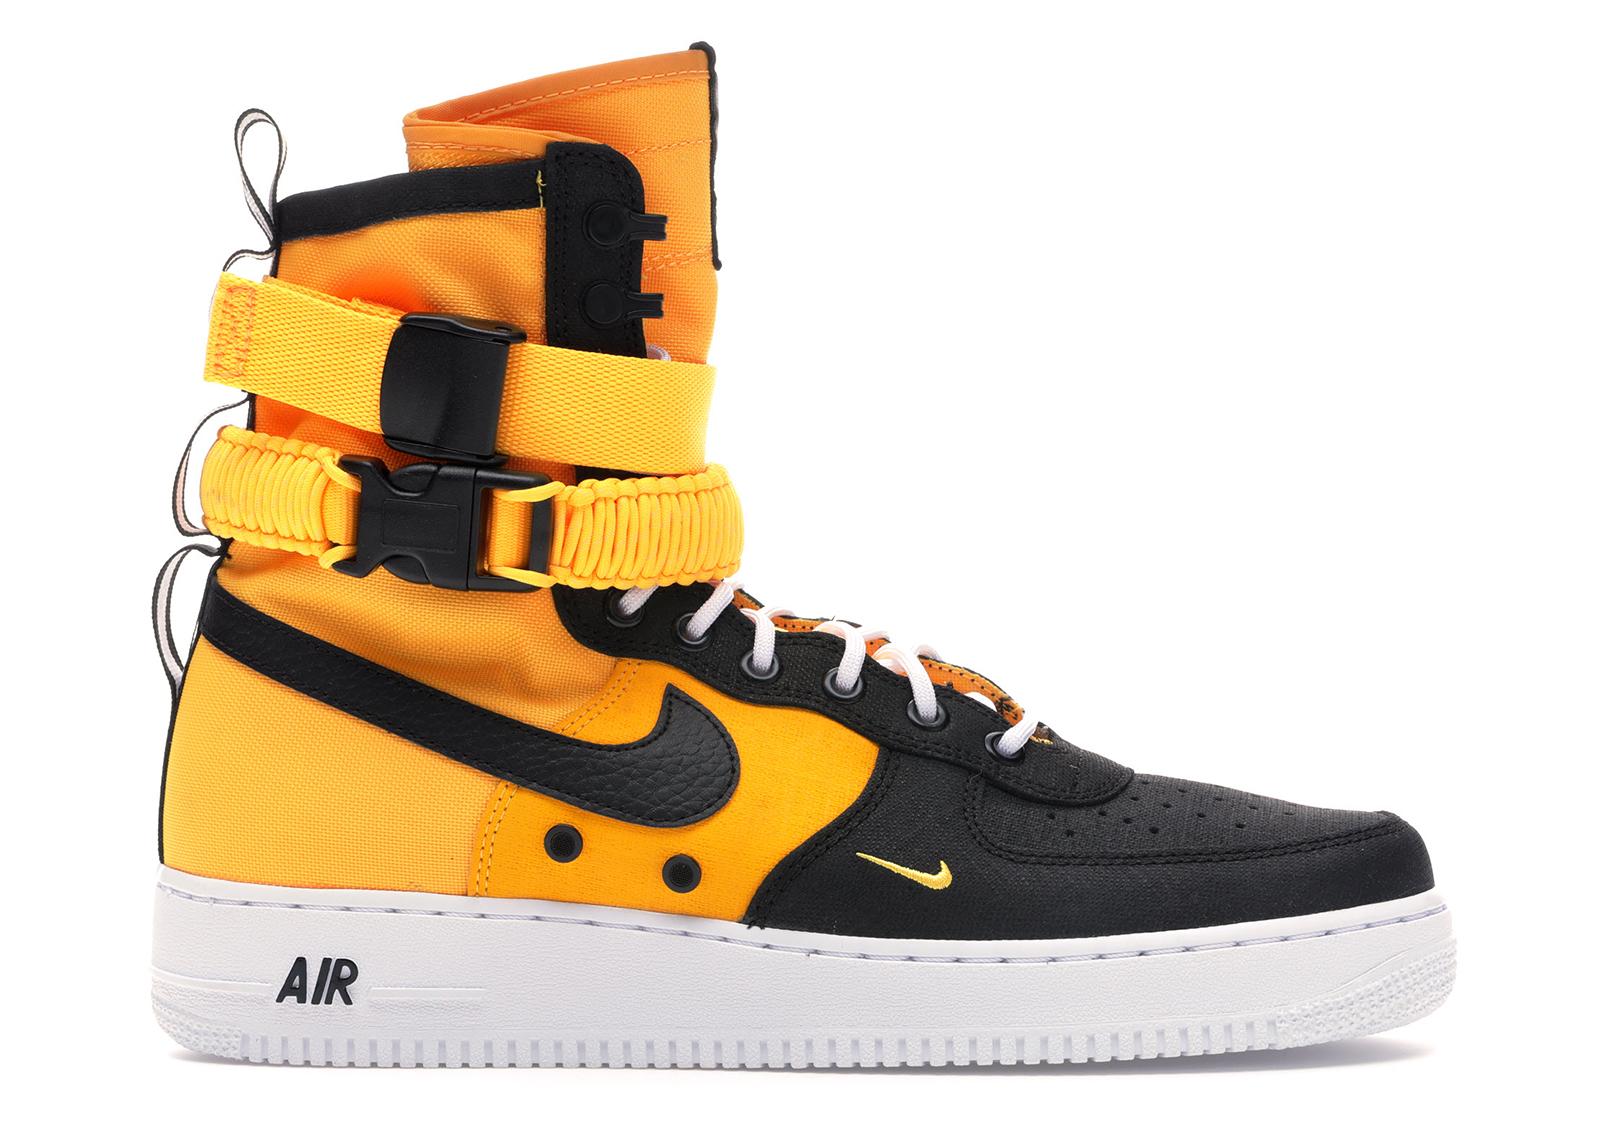 Nike SF Air Force 1 High Laser Orange - 864024-800